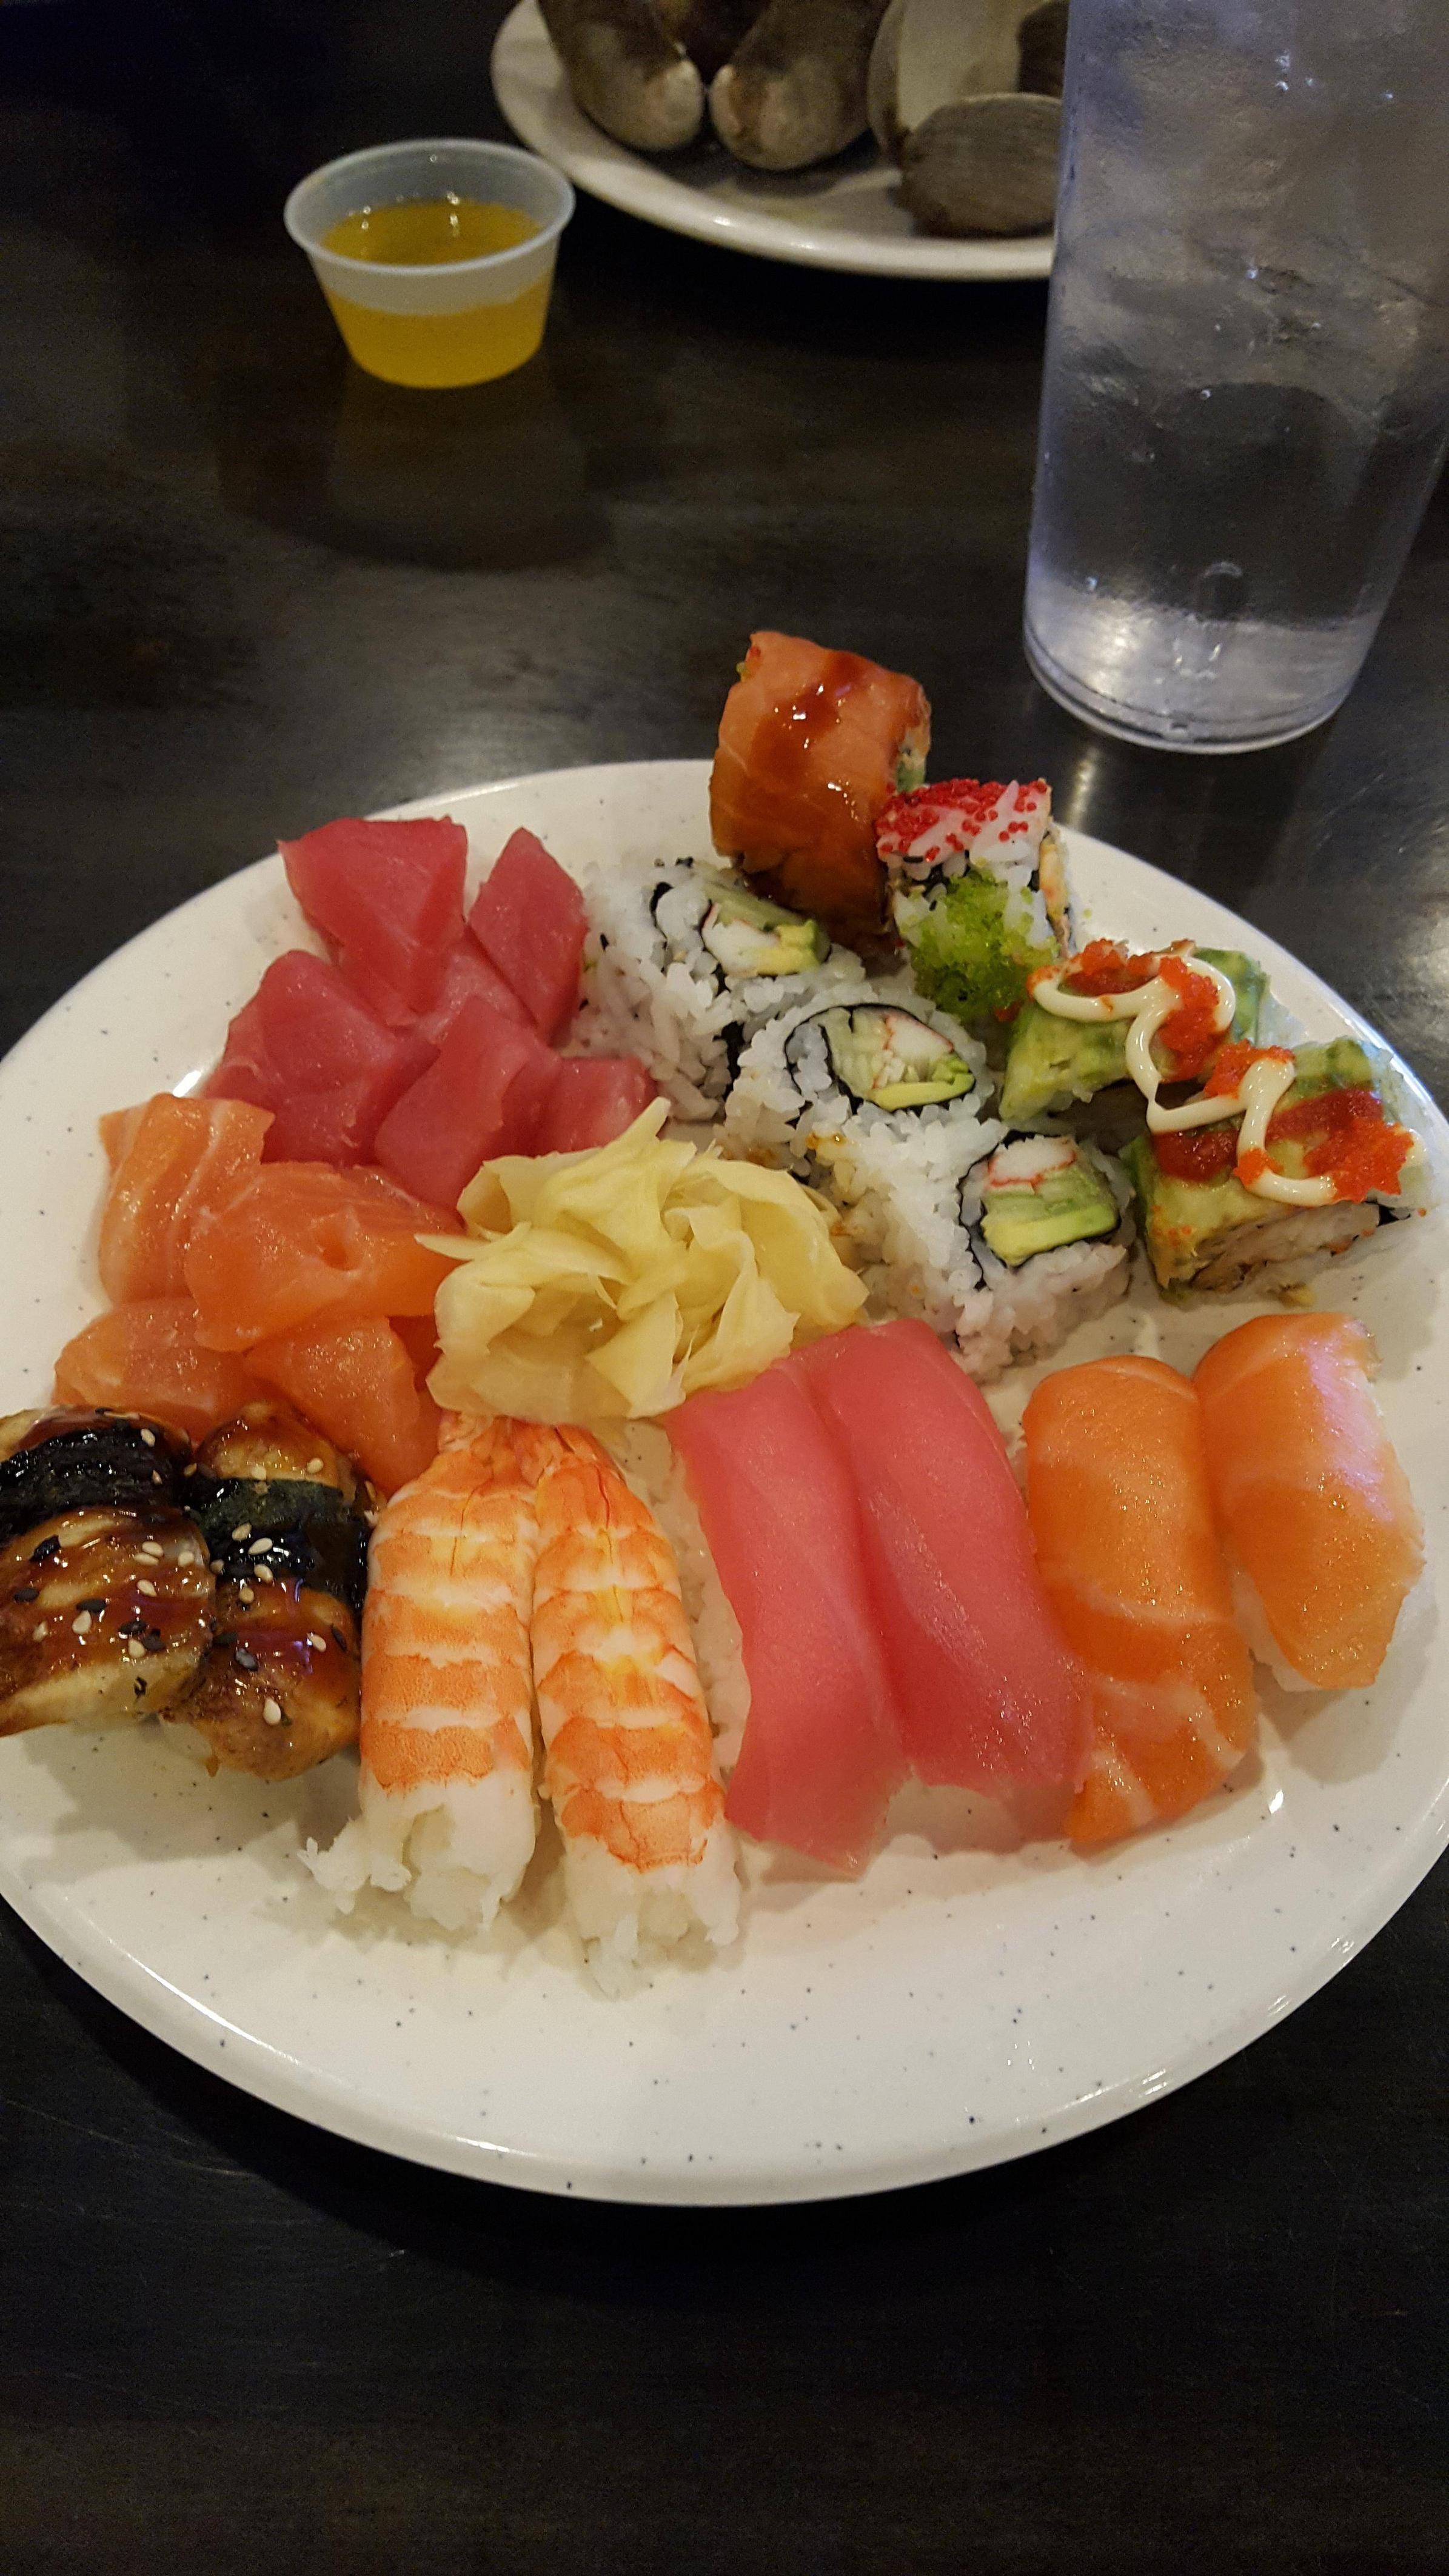 yukai buffet in virginia beach sushi food foodporn japanese rh pinterest com yukai japanese buffet coupons yukai japanese & seafood buffet virginia beach va